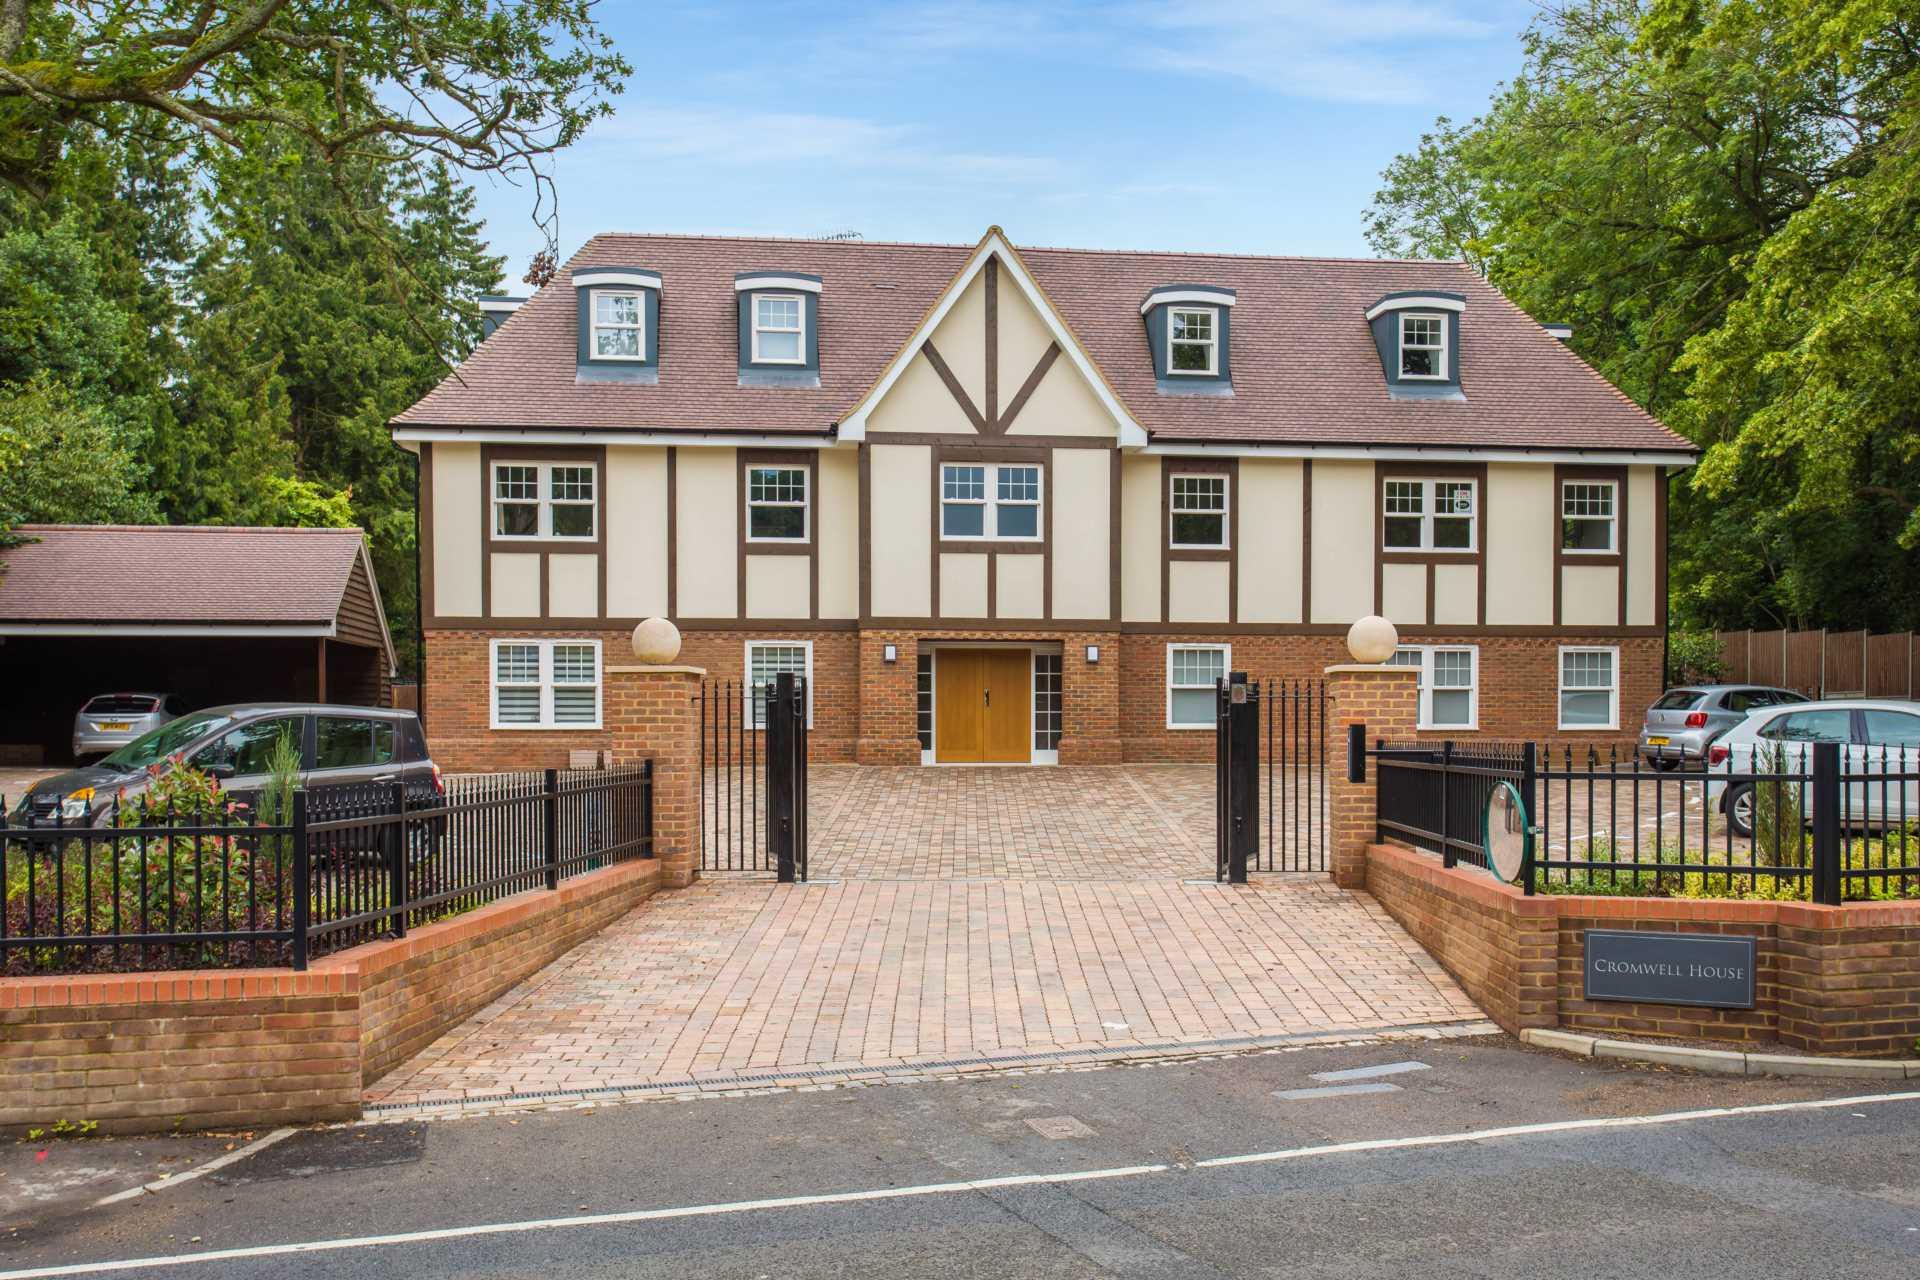 Cromwell House Image